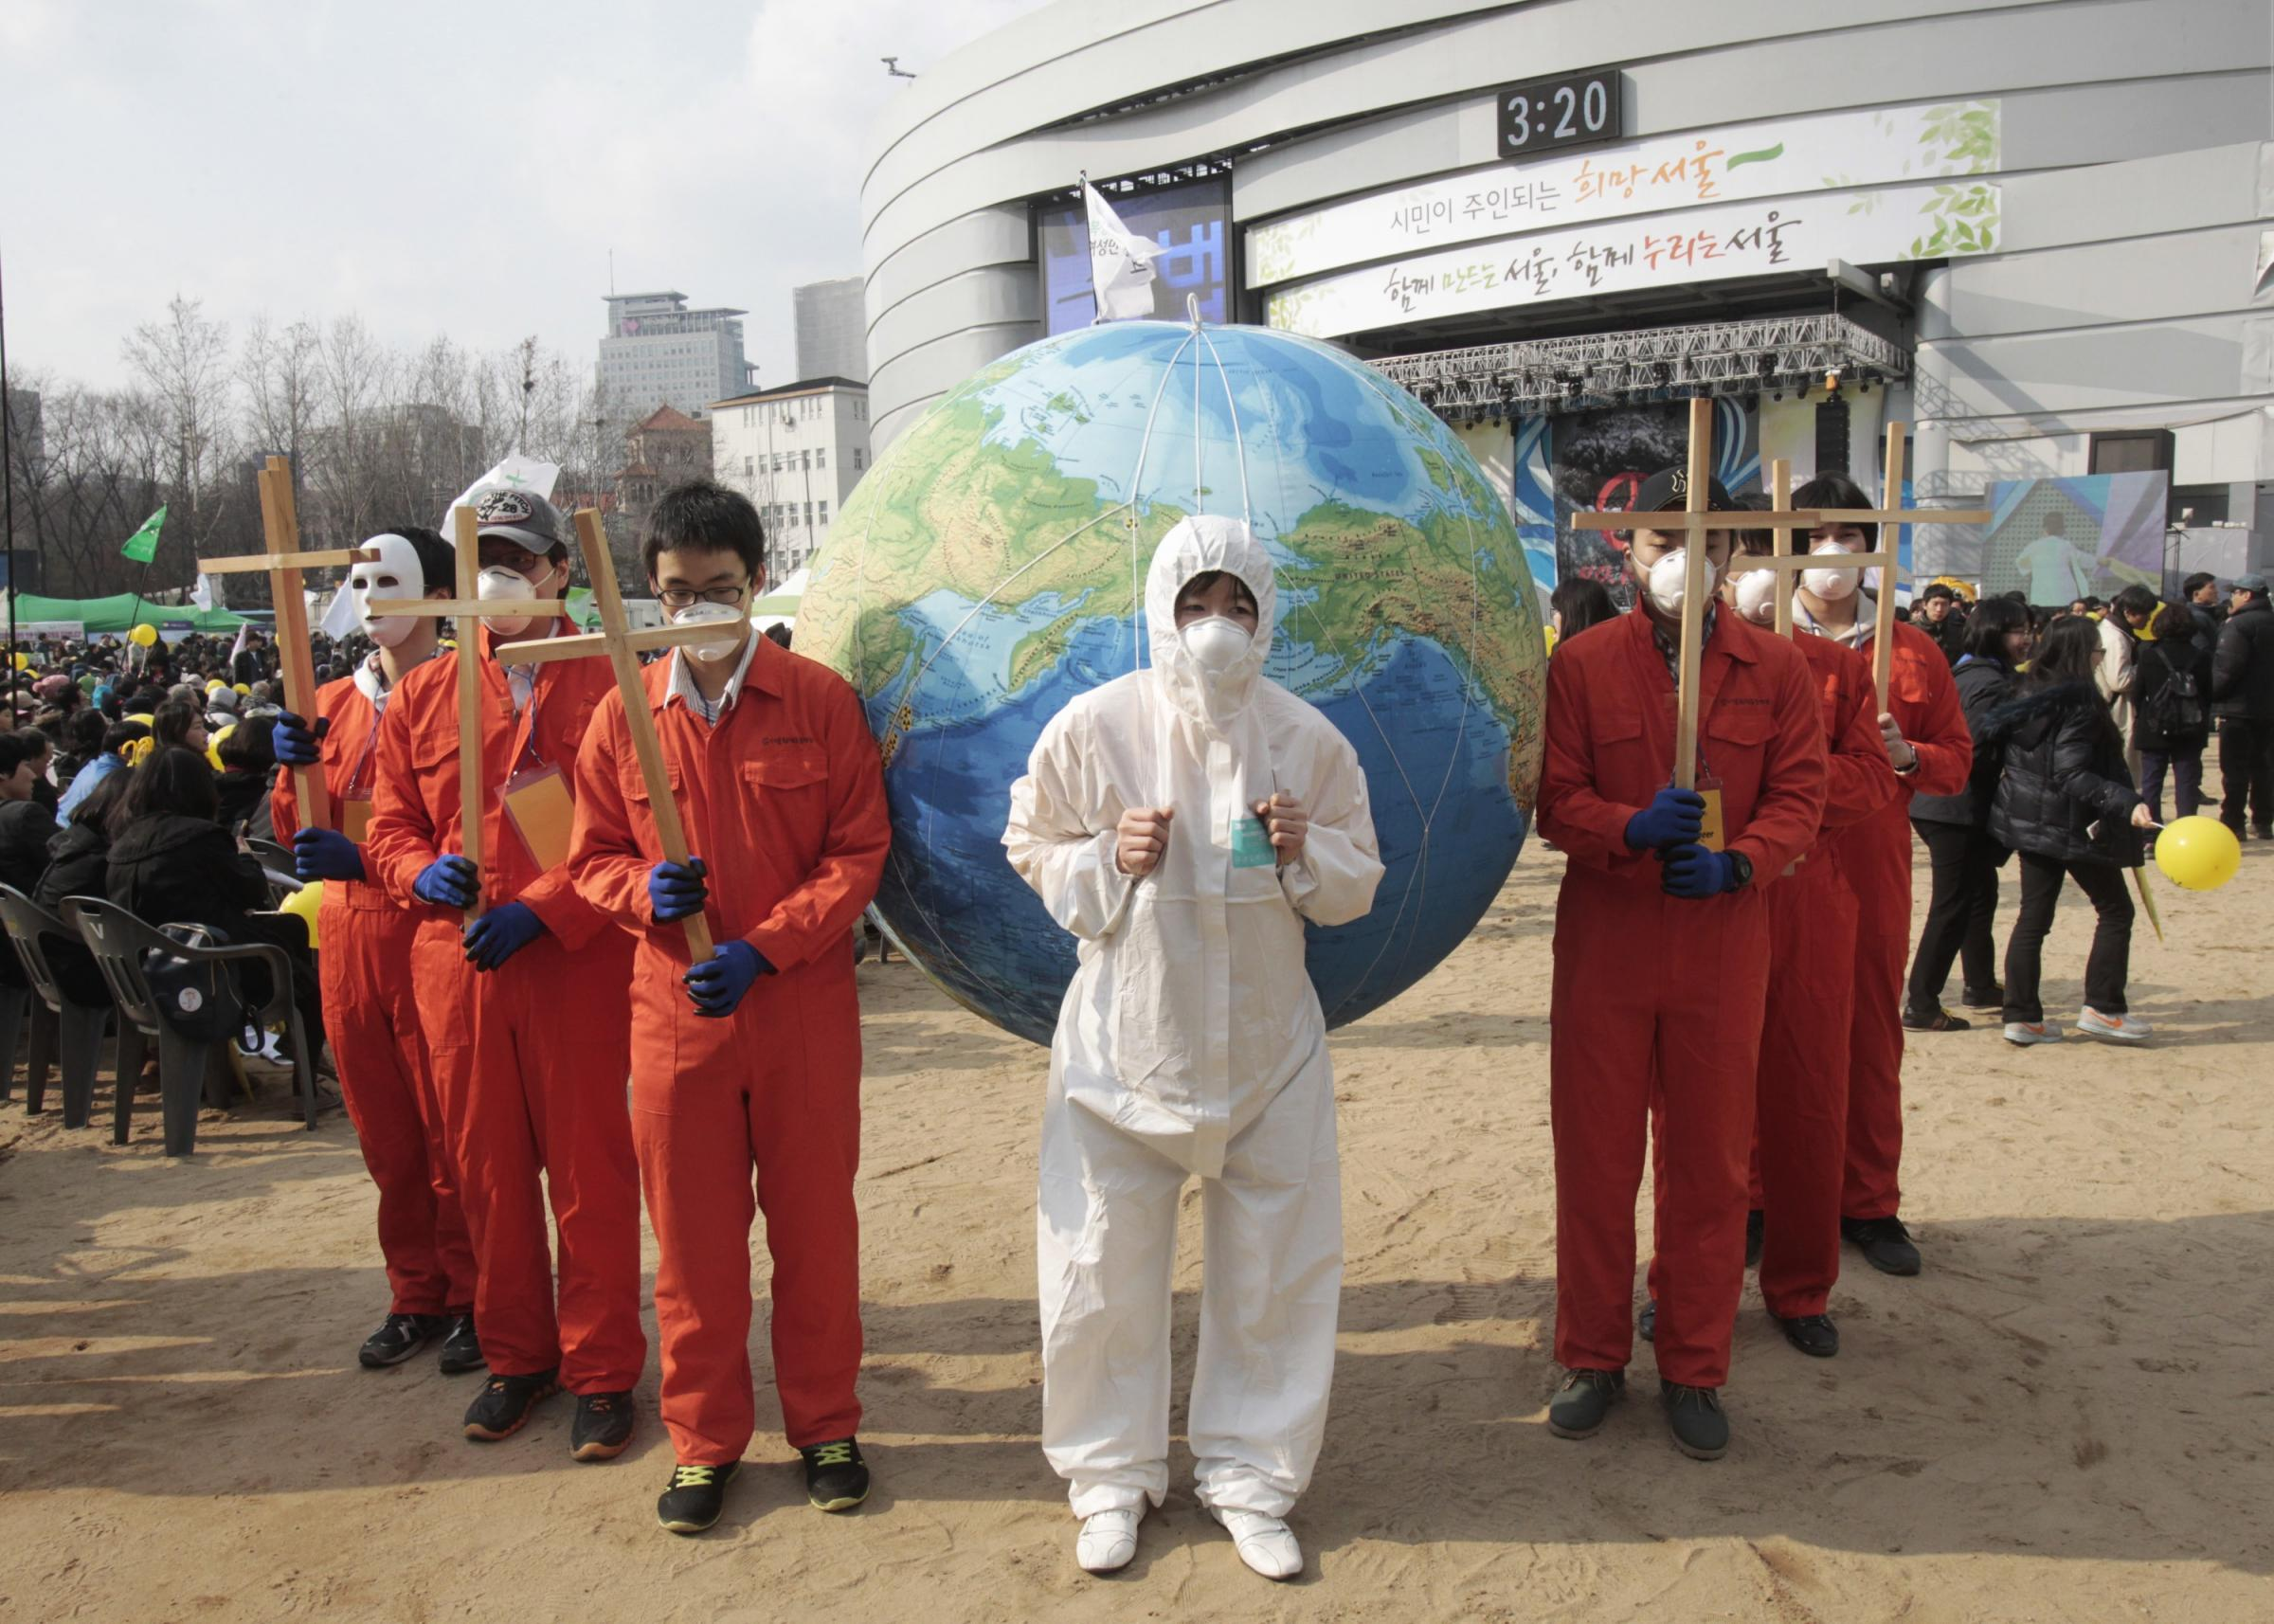 Nucleare, cambiare le regole dopo Fukushima